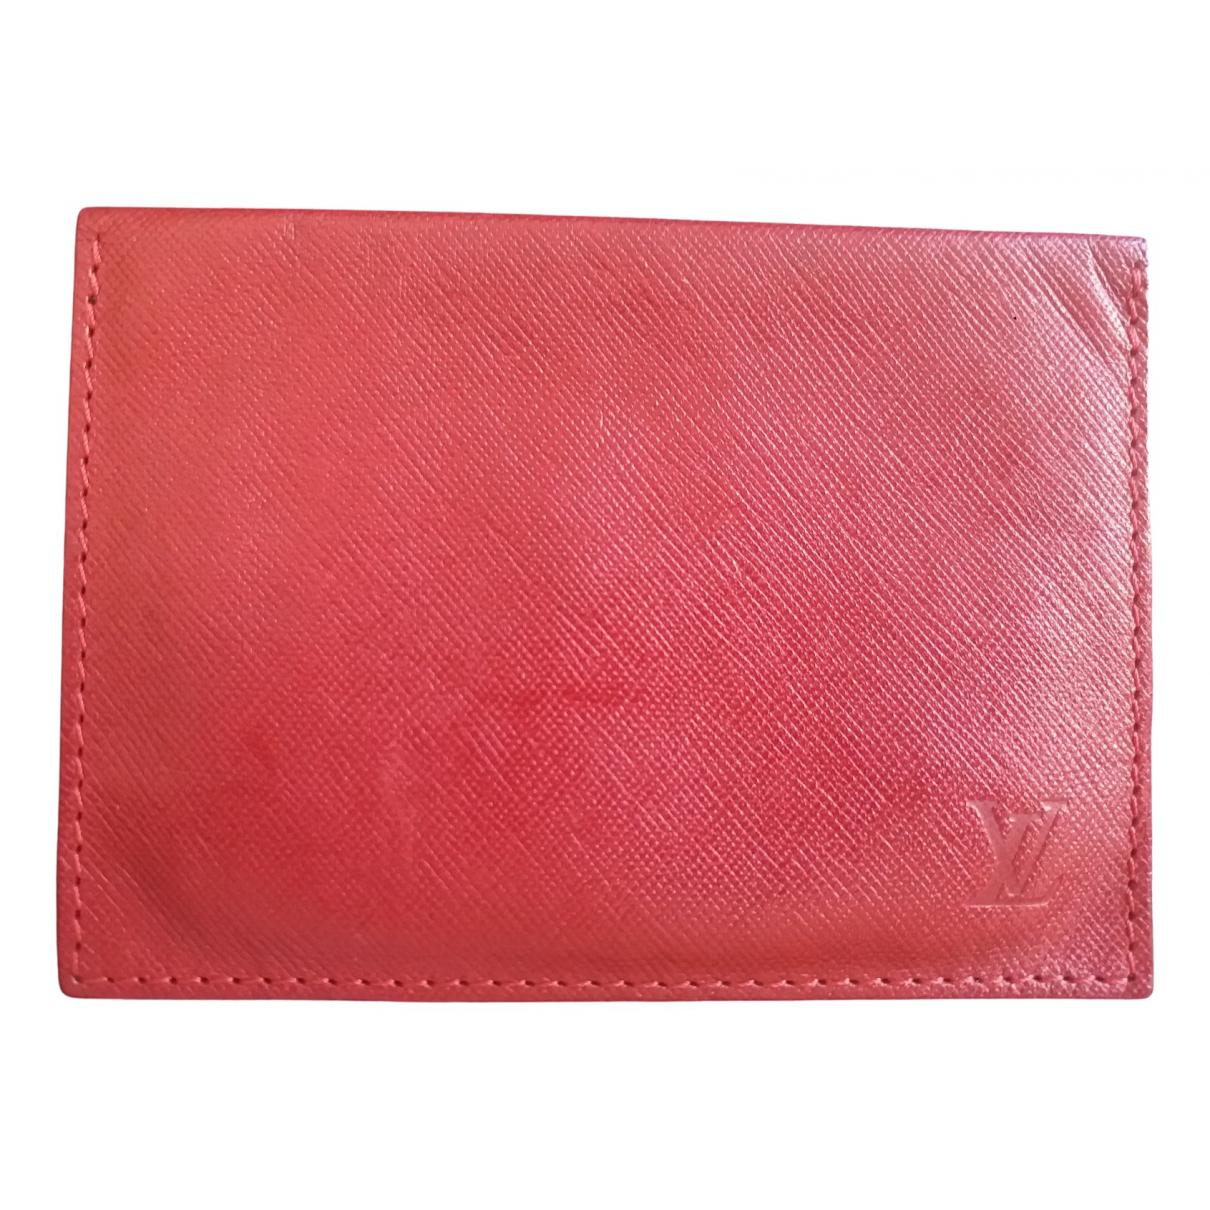 Louis Vuitton \N Kleinlederwaren in  Rot Leder